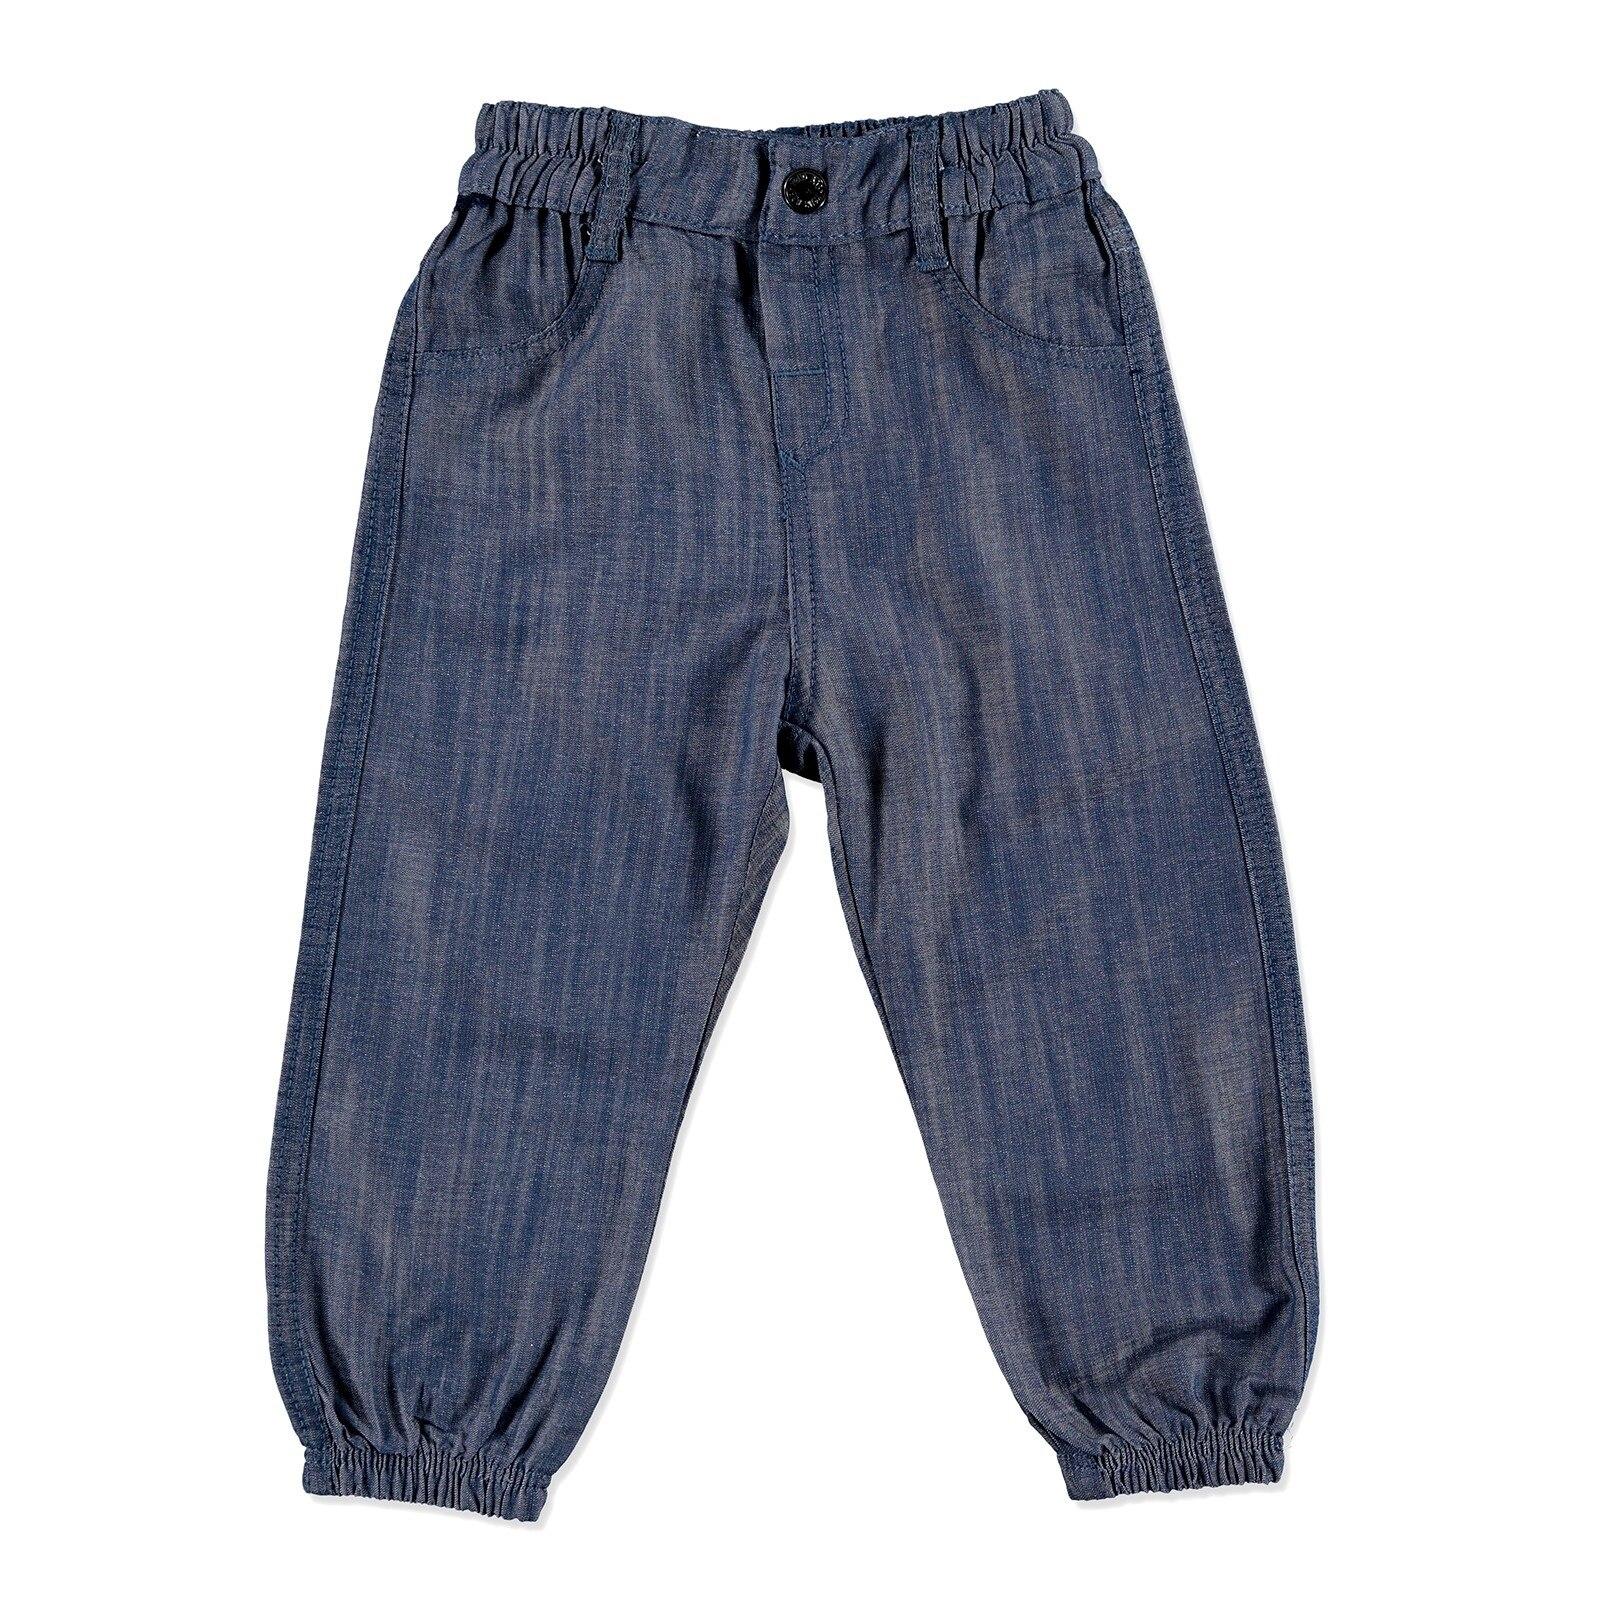 Ebebek HelloBaby Summer Baby Cotton Pant